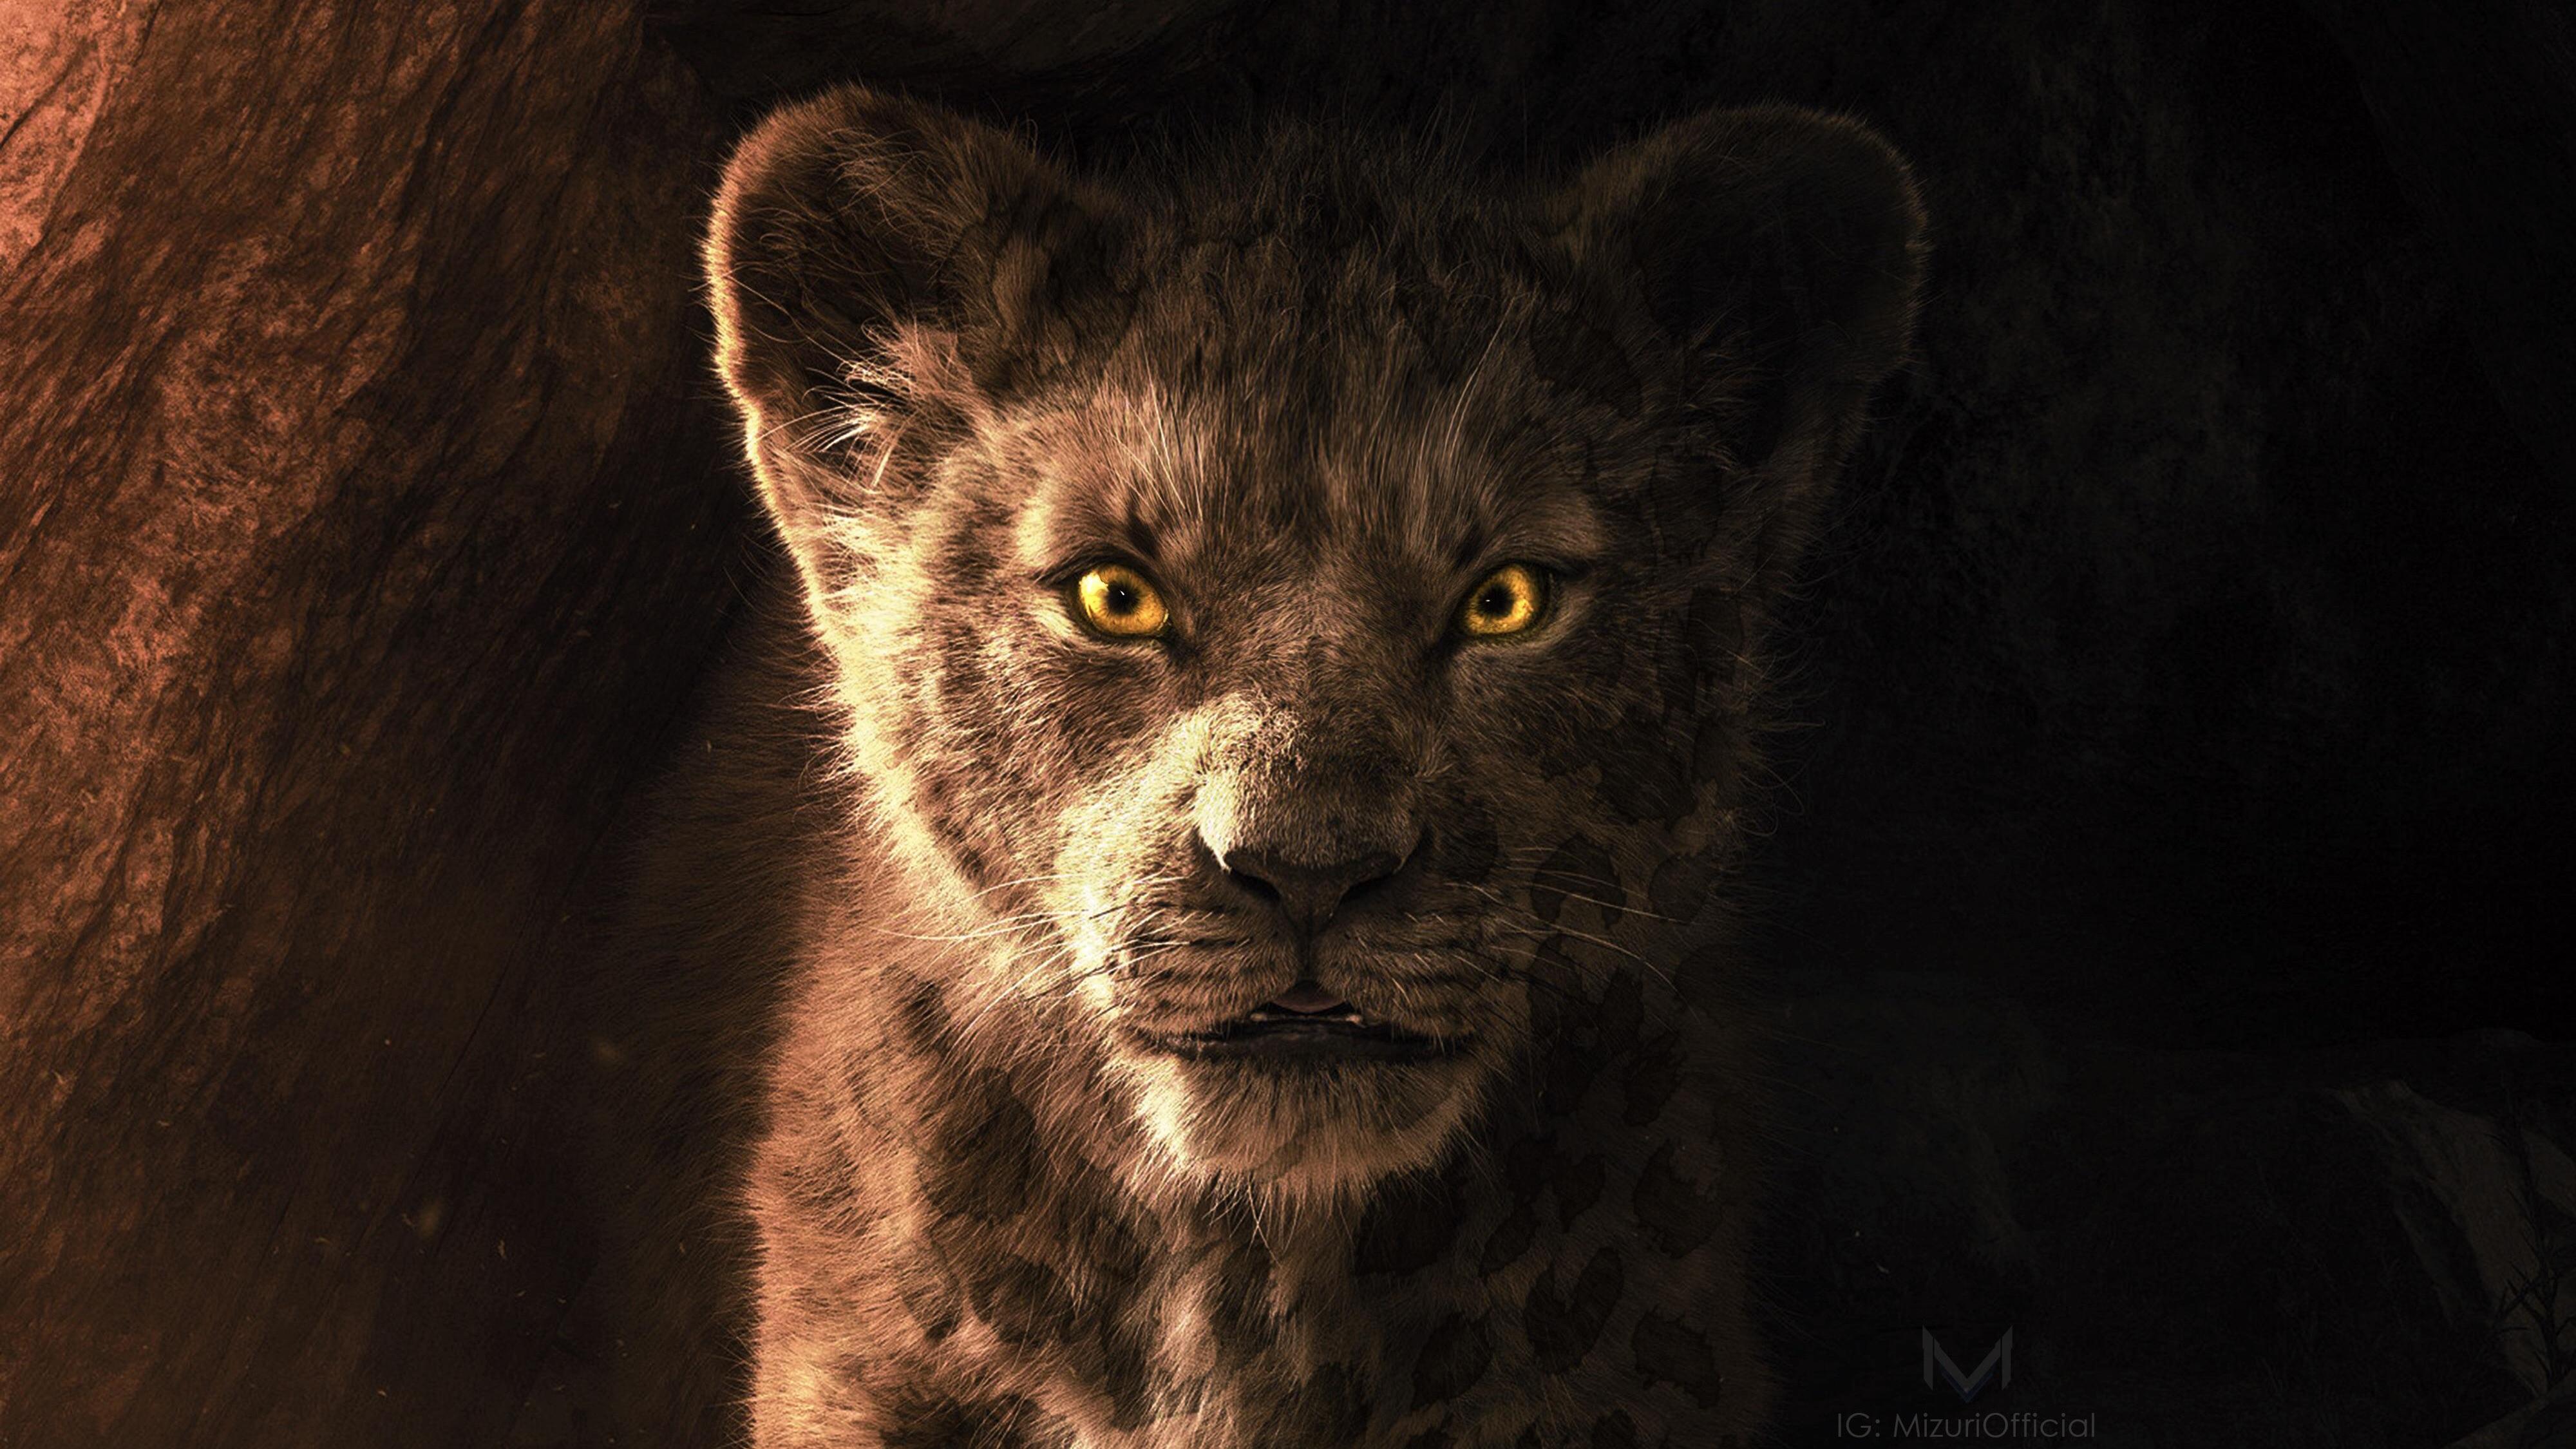 1600x900 The Lion King Simba 1600x900 Resolution Hd 4k Wallpapers